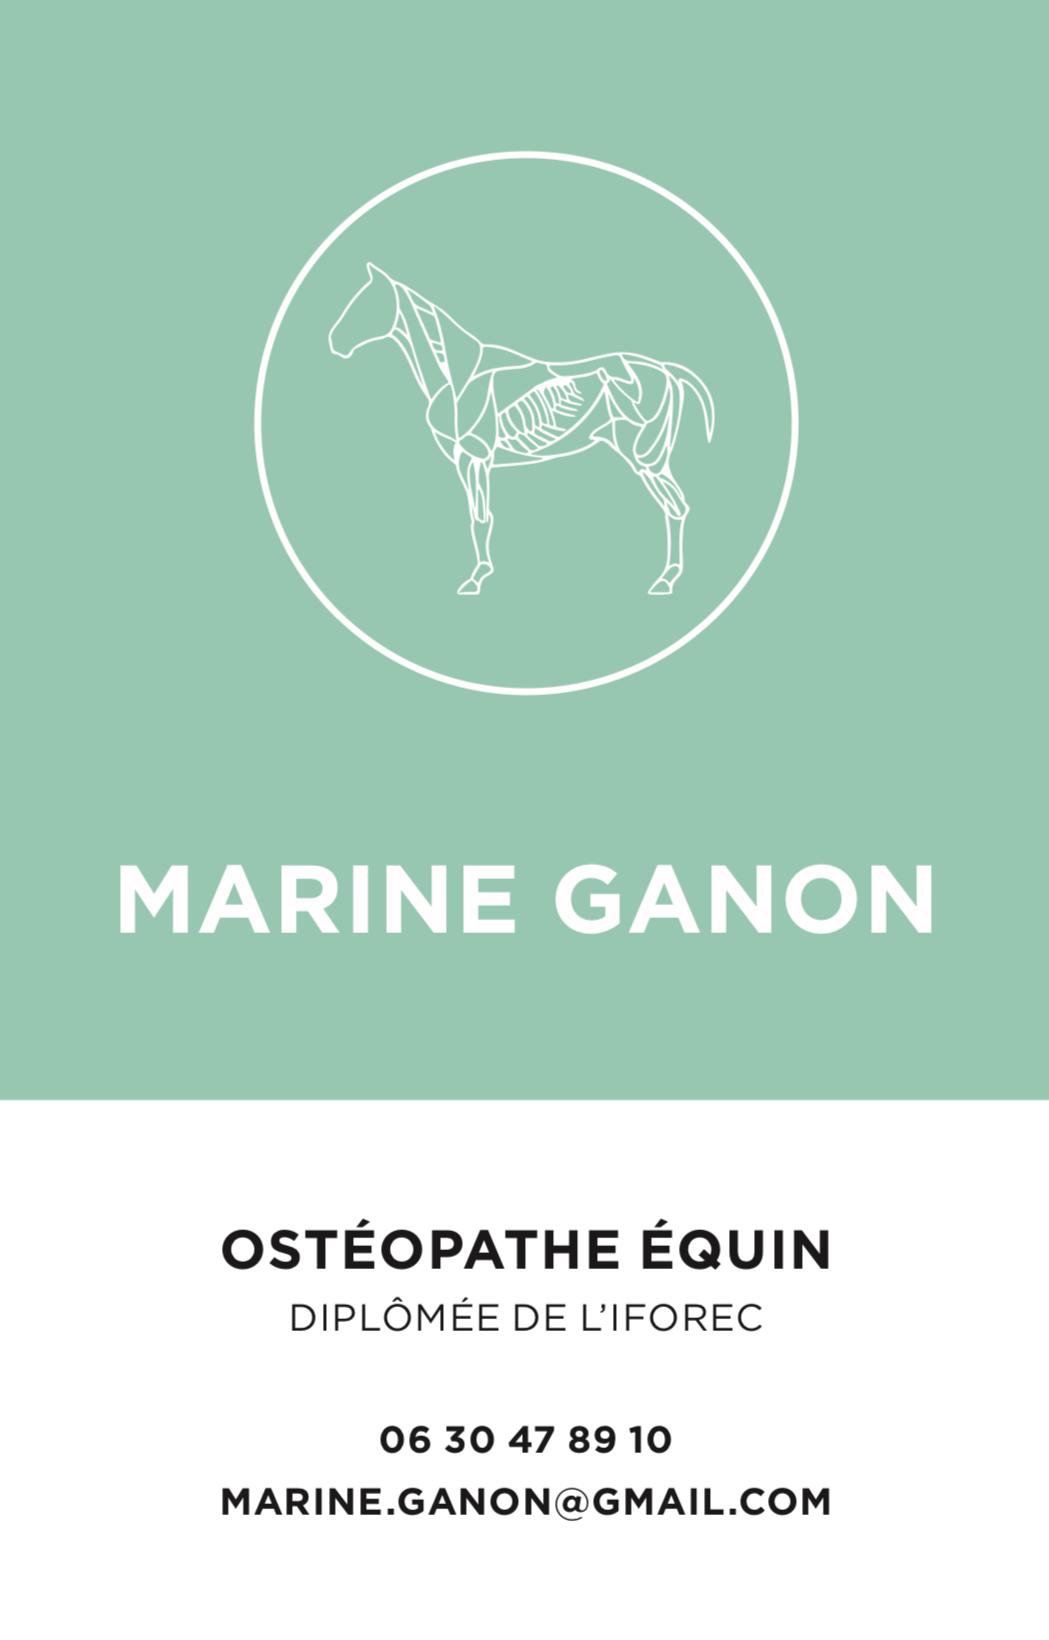 carte de visite de Marine GANON